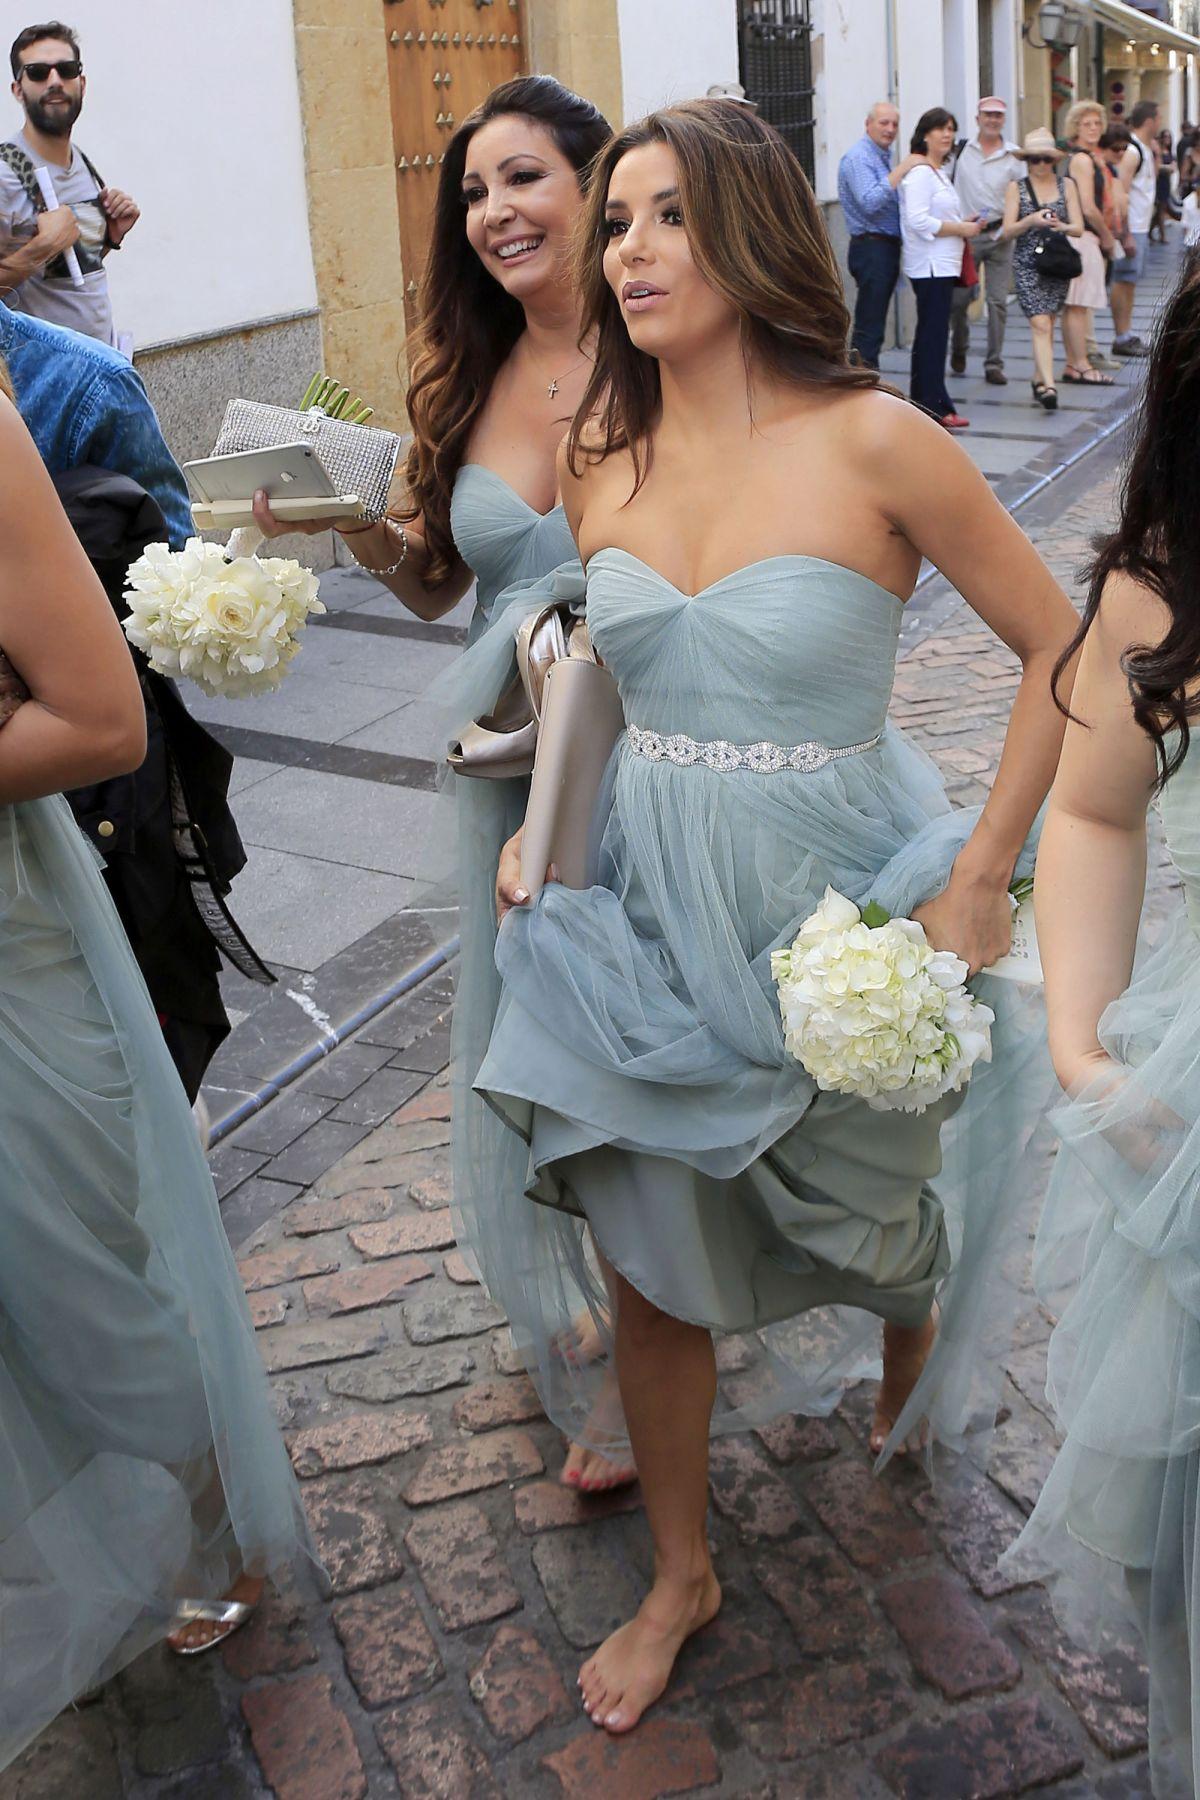 EVA LONGORIA at a Frie... Eva Longoria Wedding